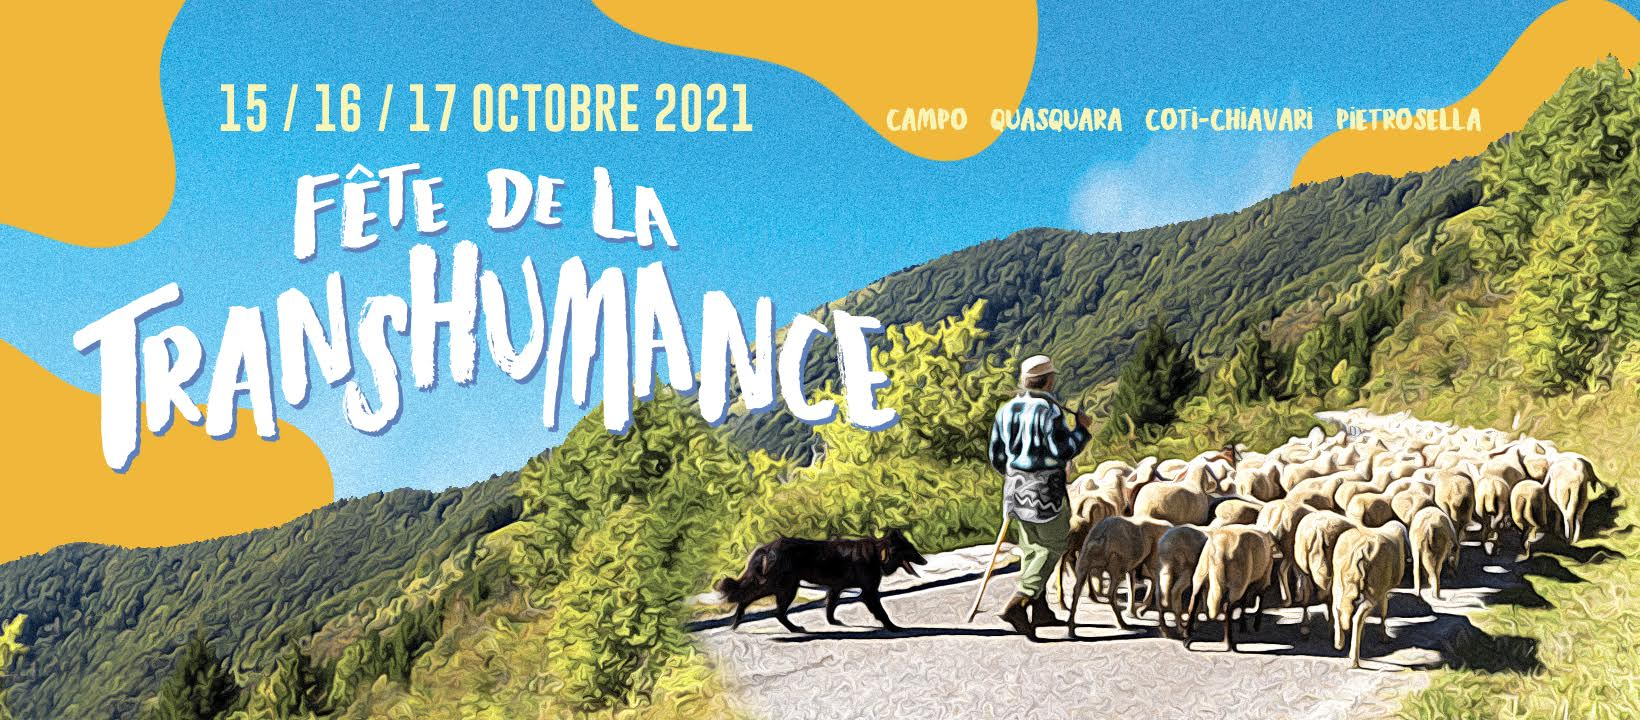 La fête de la transhumance revient à Pietrosella, Coti-Chiavari, Quasquara, Campo